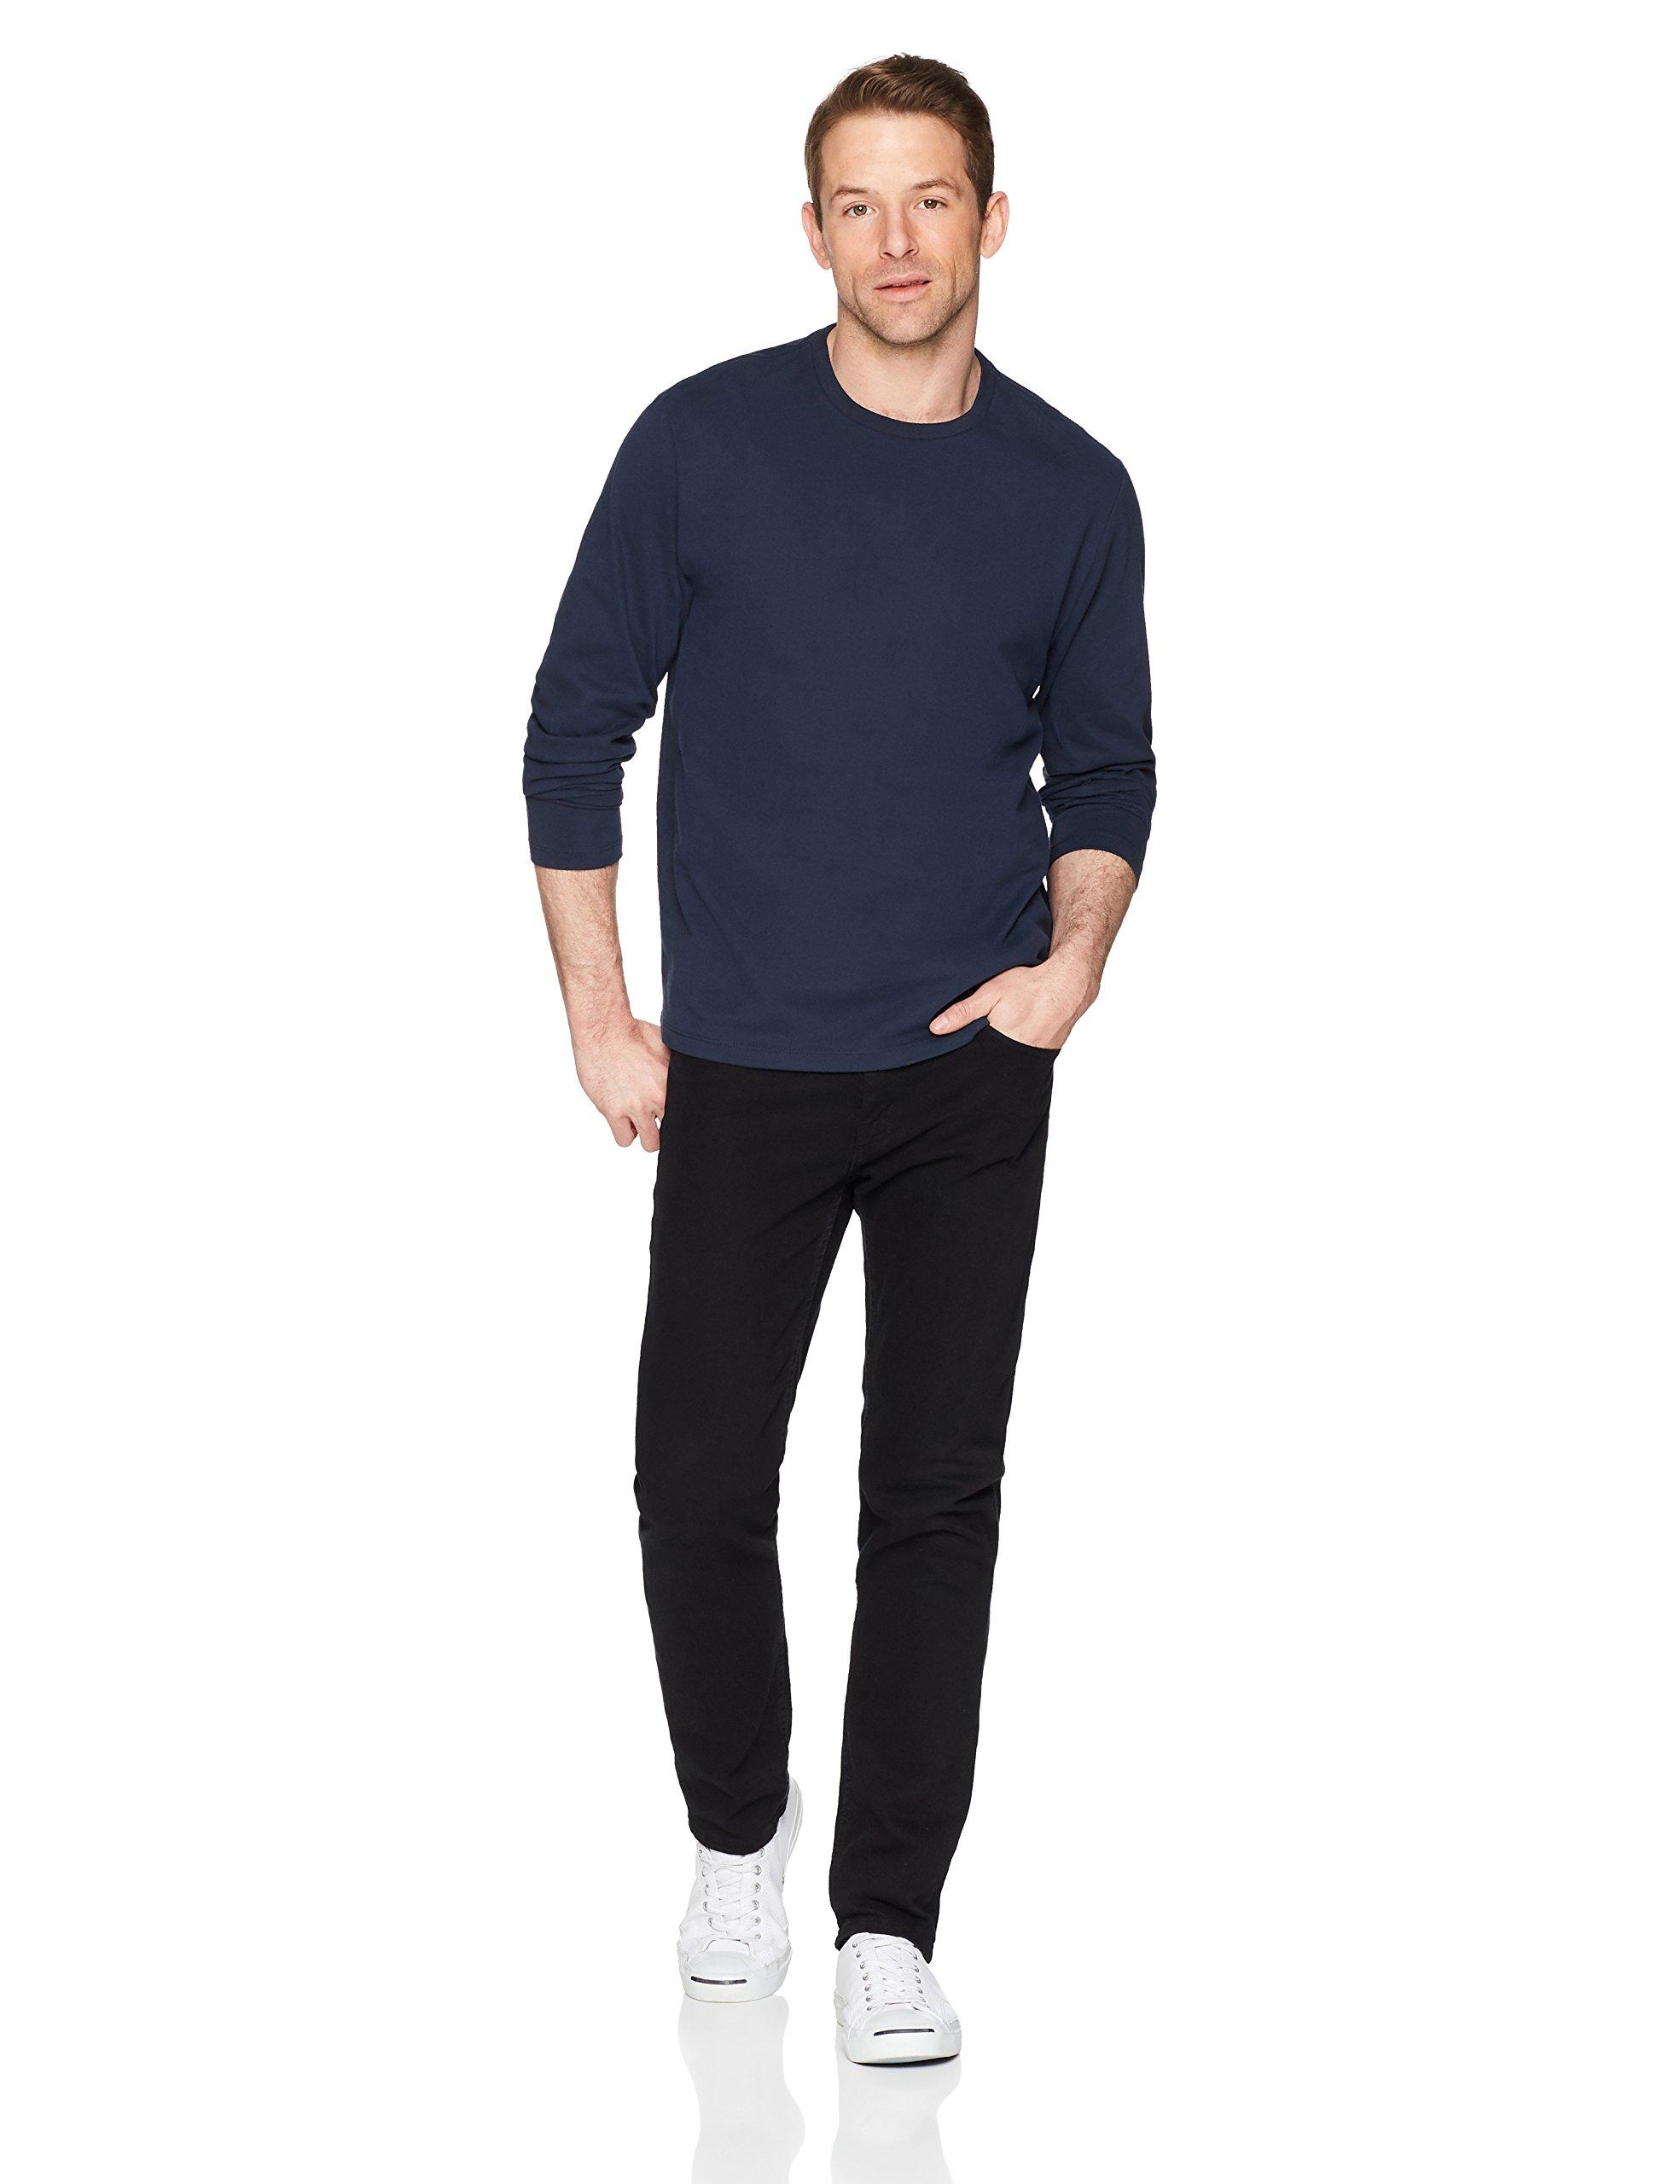 Amazon Essentials Men's Regular-Fit Long-Sleeve T-Shirt, Navy, Medium by Amazon Essentials (Image #2)